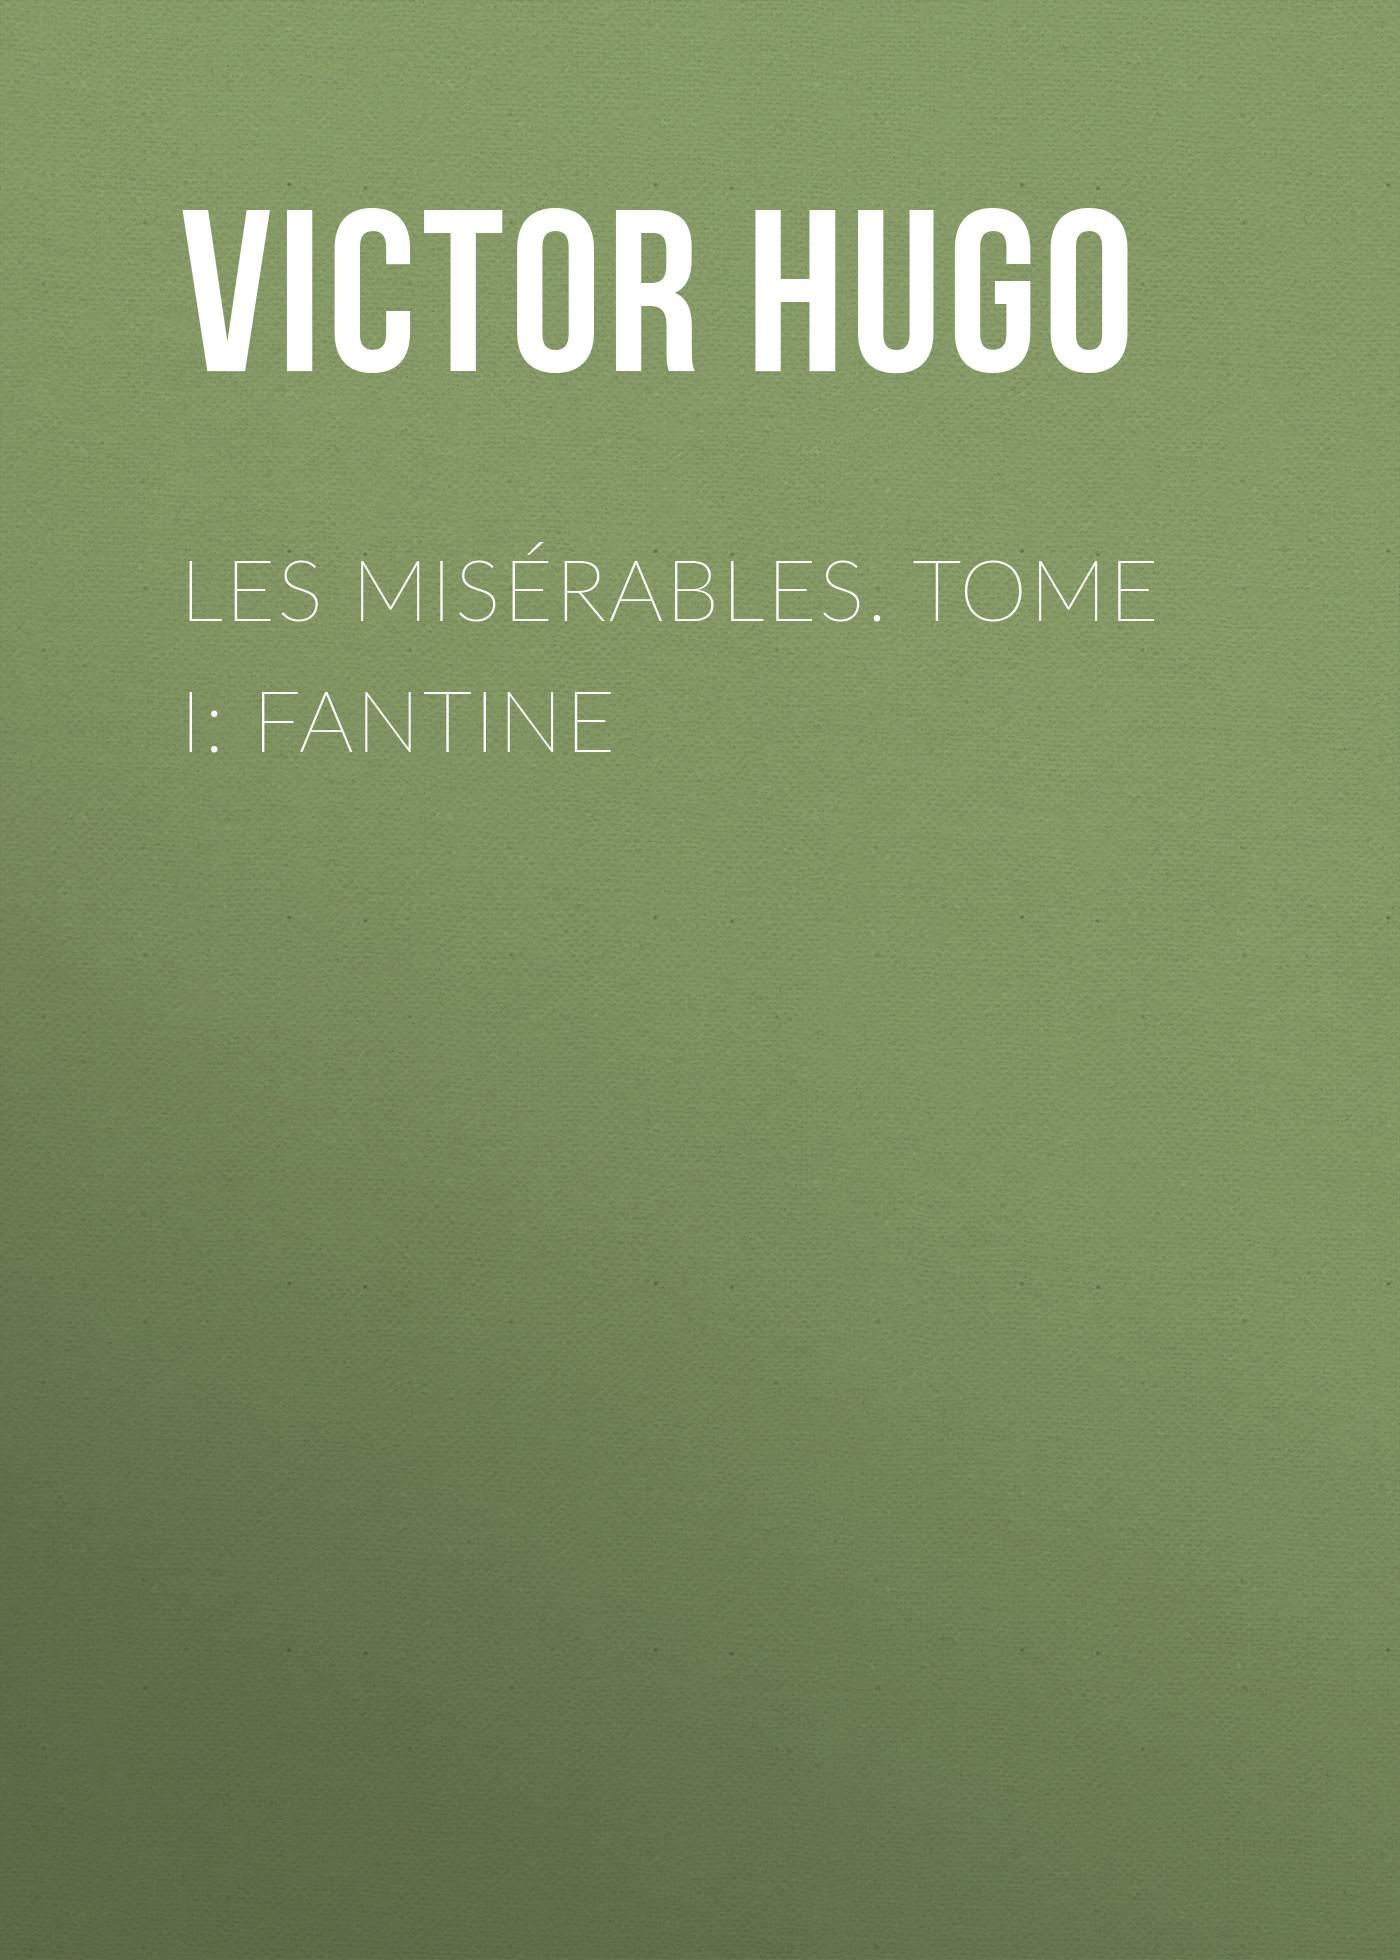 Виктор Мари Гюго Les misérables. Tome I: Fantine dumas a les quarante cinq tome i